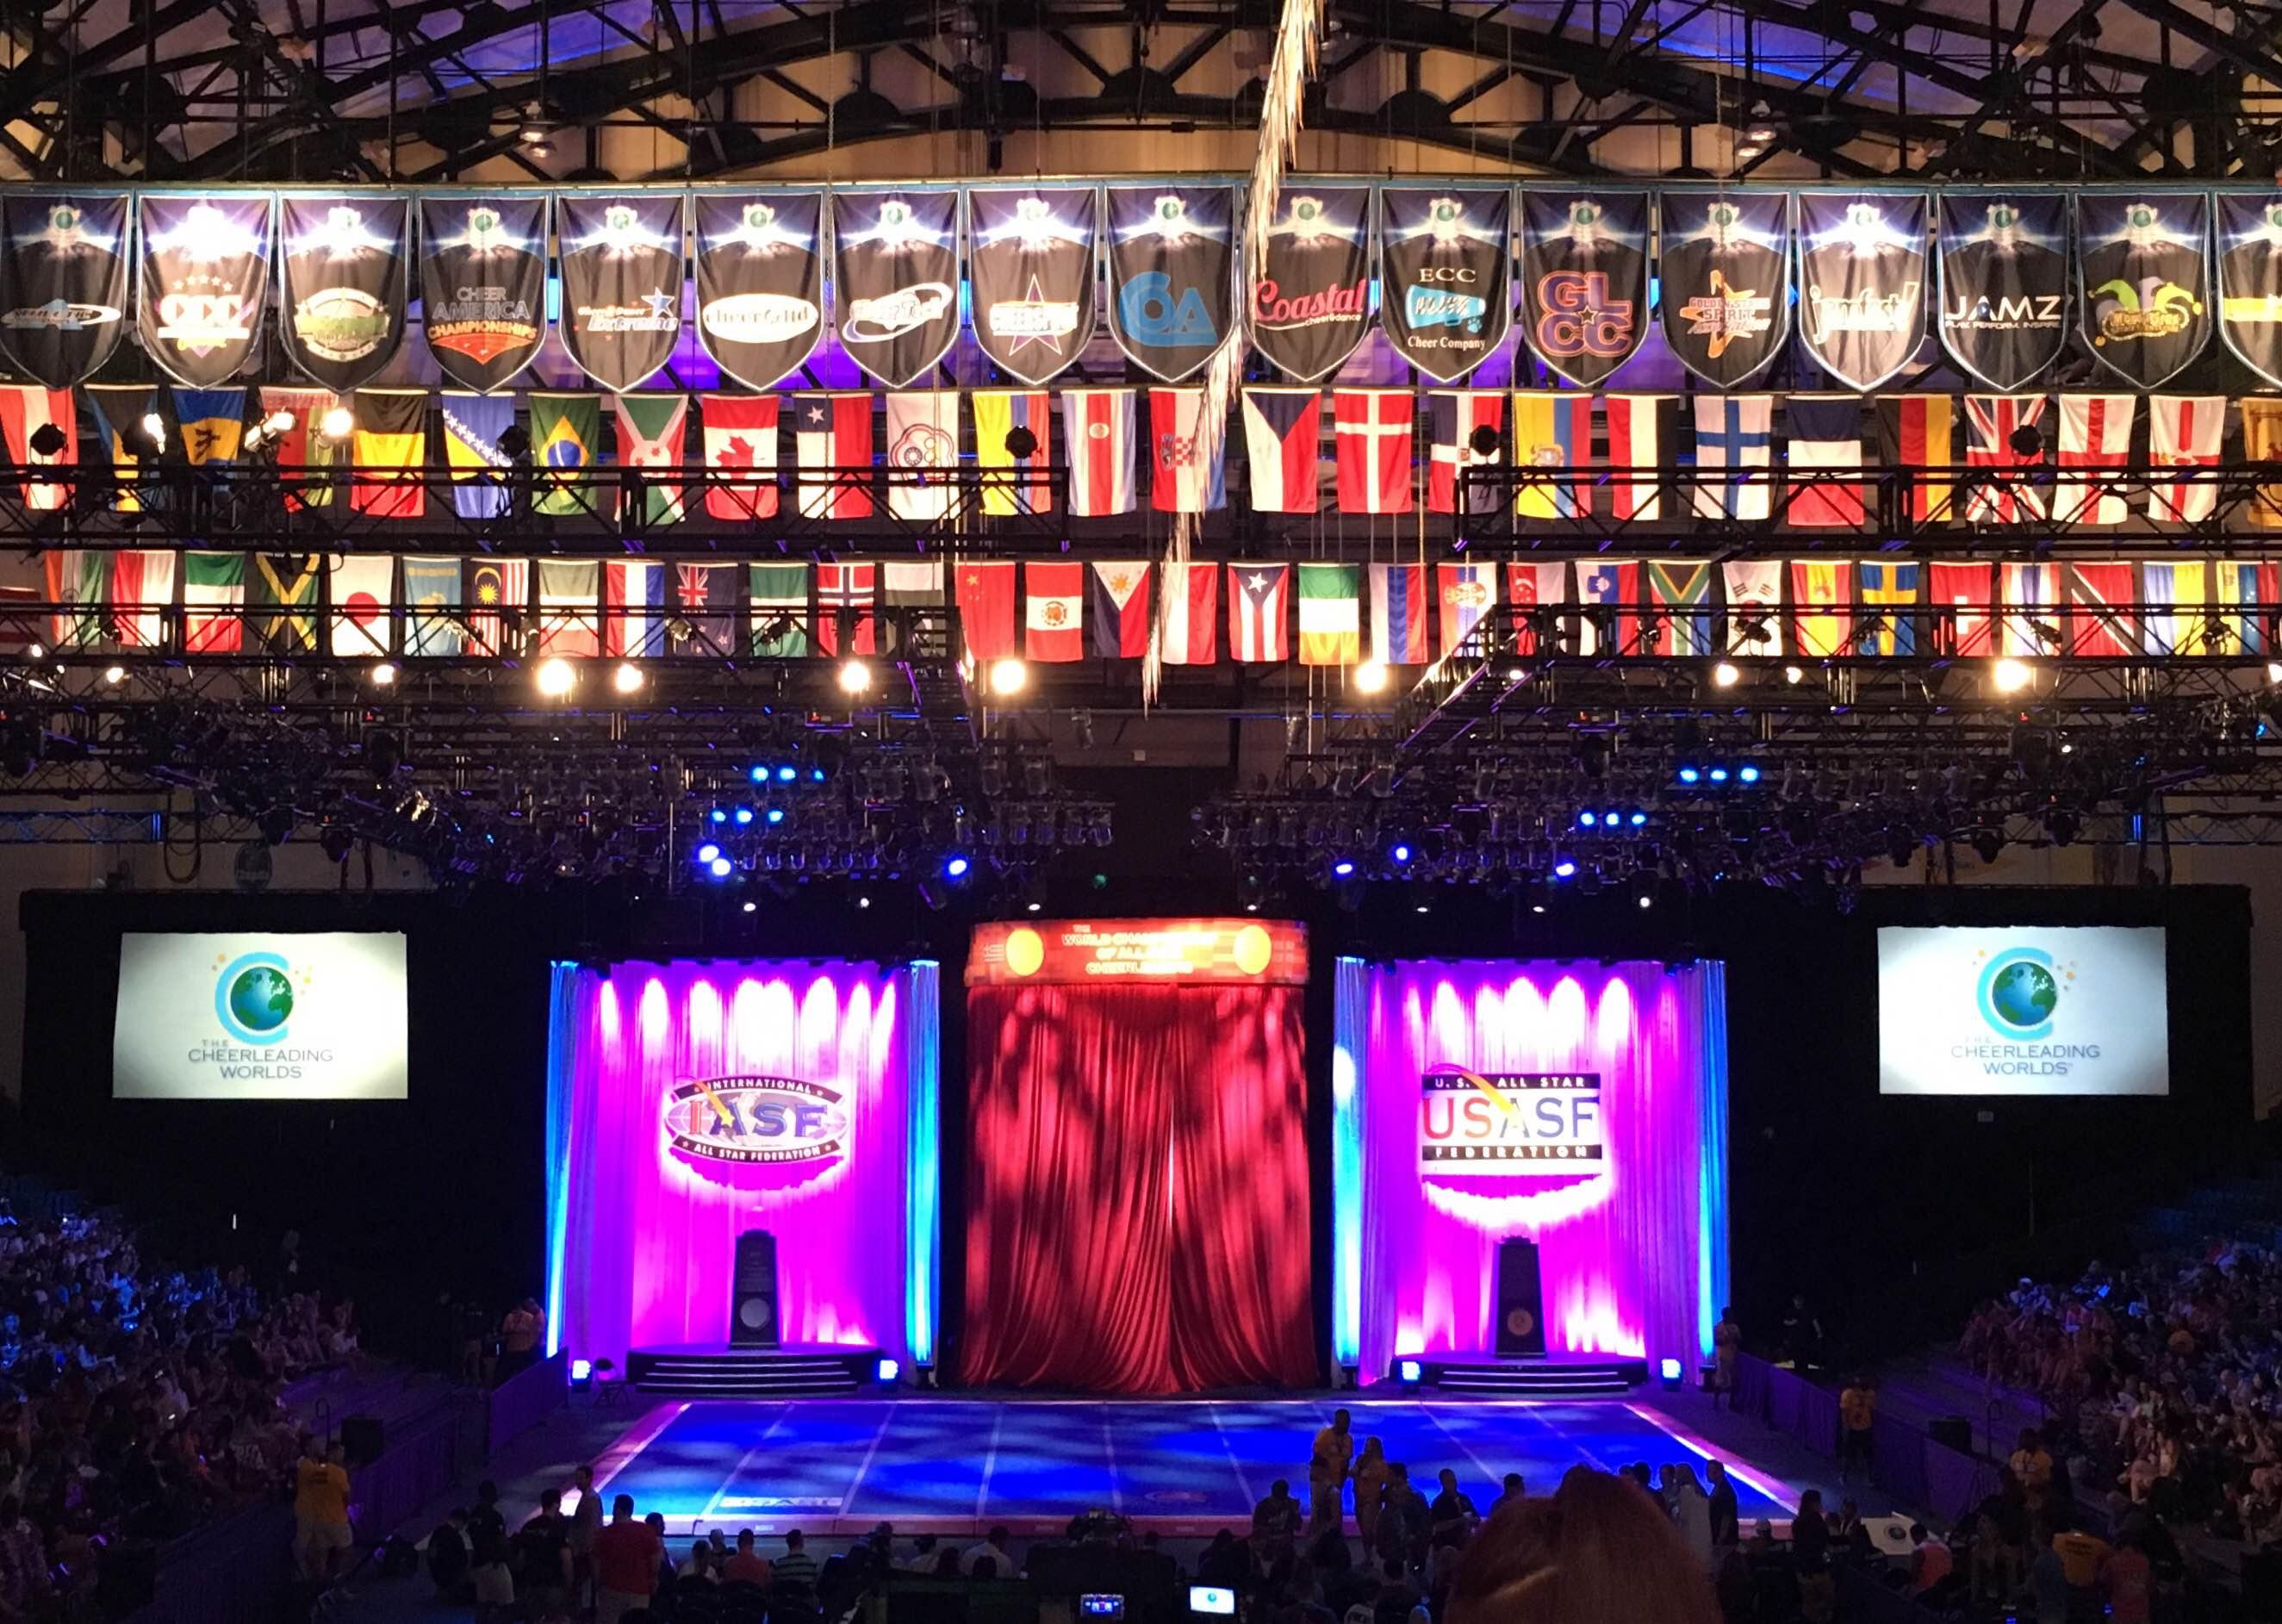 USASF Cheerleading Worlds 2016 Results